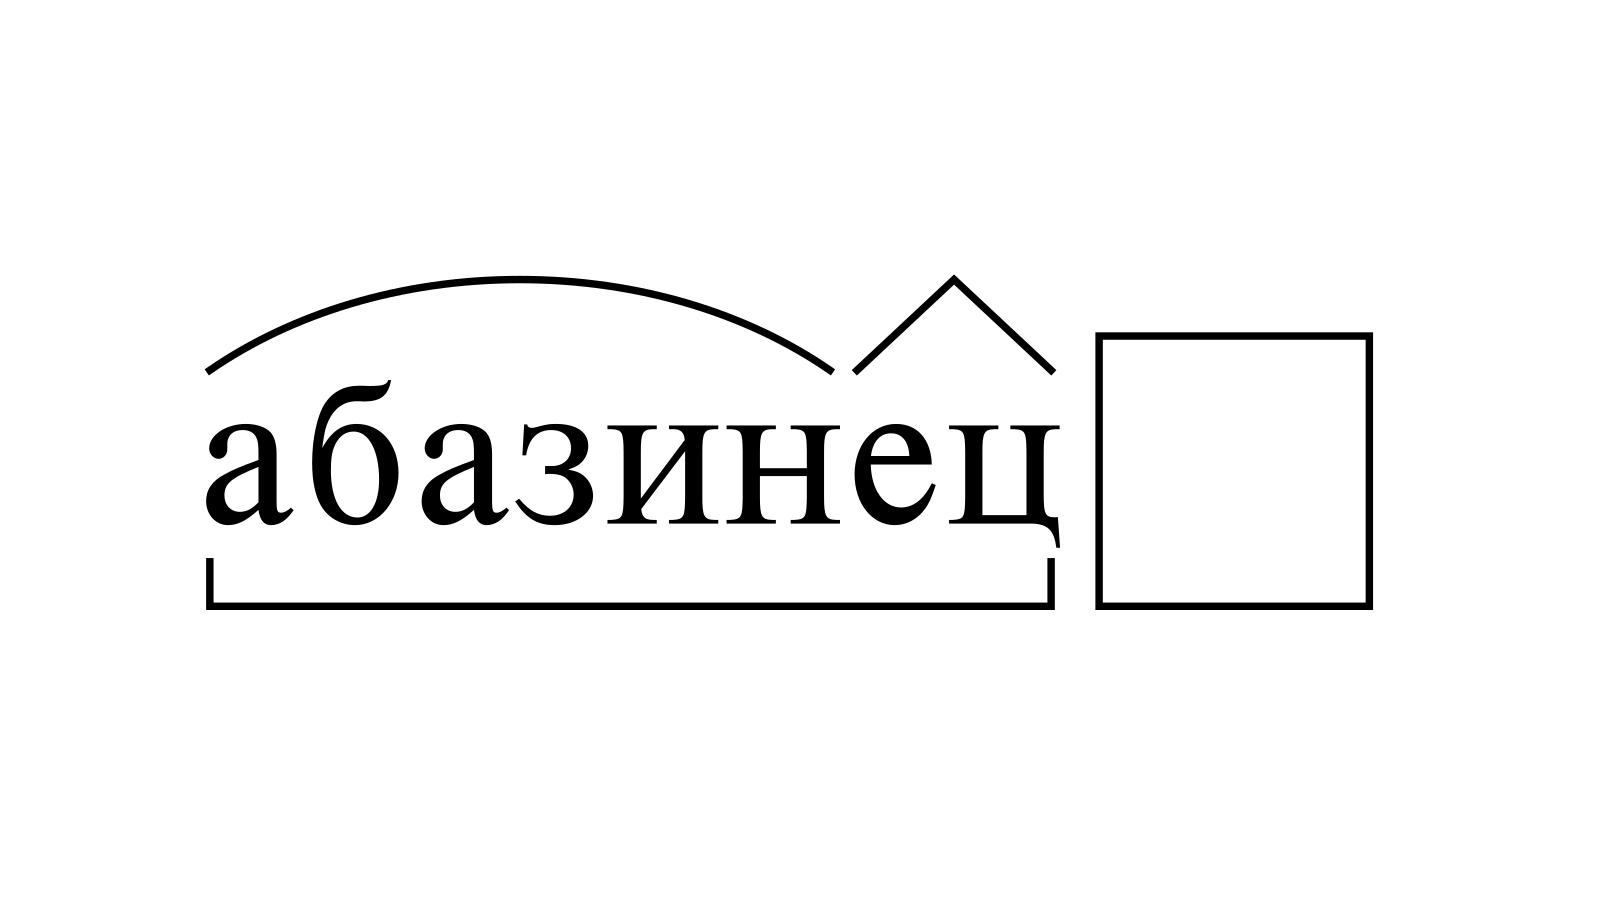 Разбор слова «абазинец» по составу